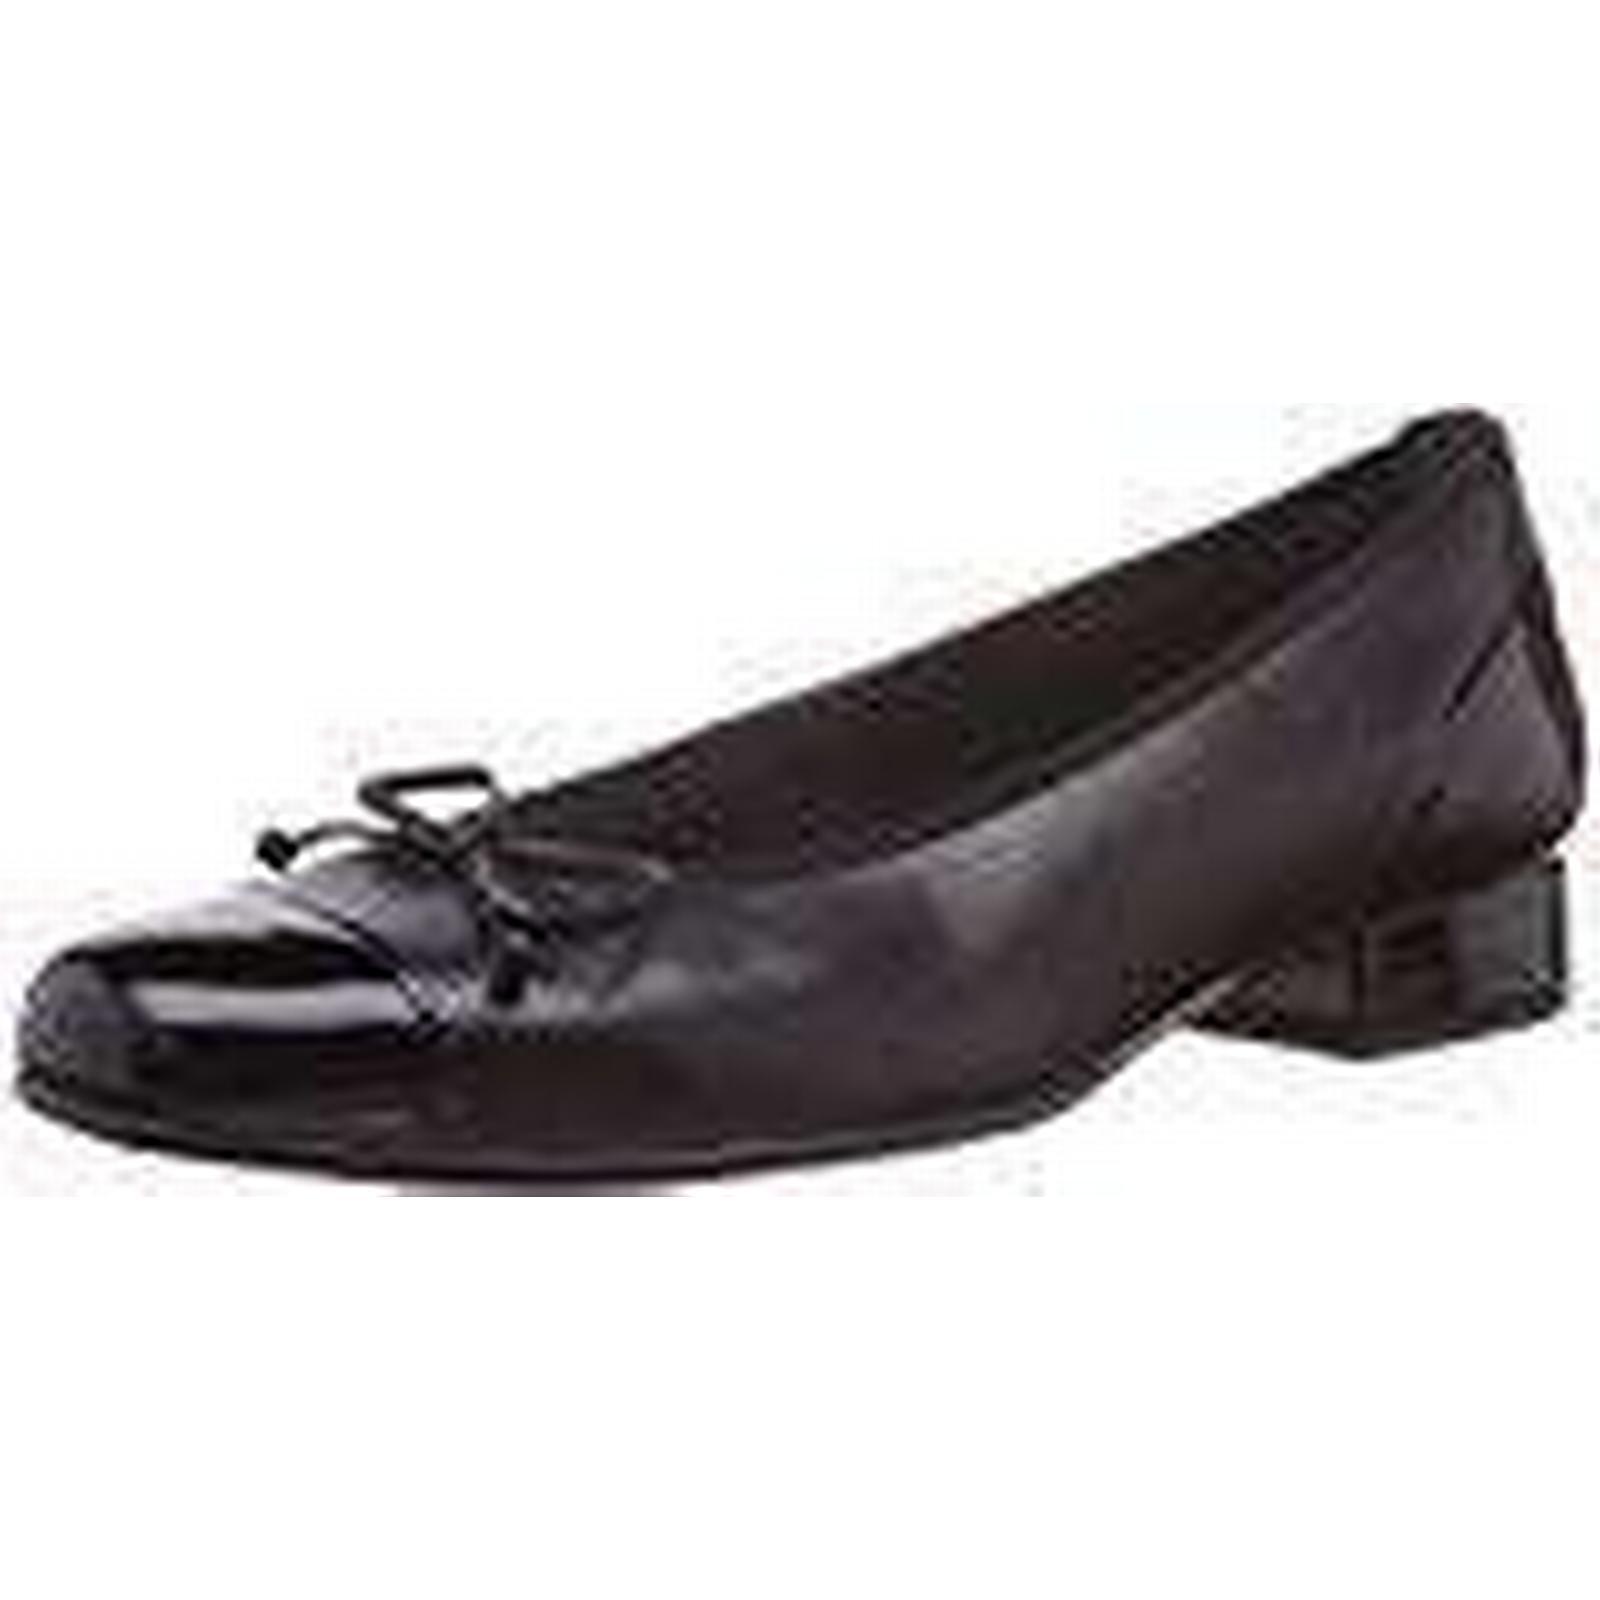 Gabor Flat, Comfort Basic Women Ballet Flat, Gabor Black (Black Leather Ht/Patent), 9 UK 7aac6b